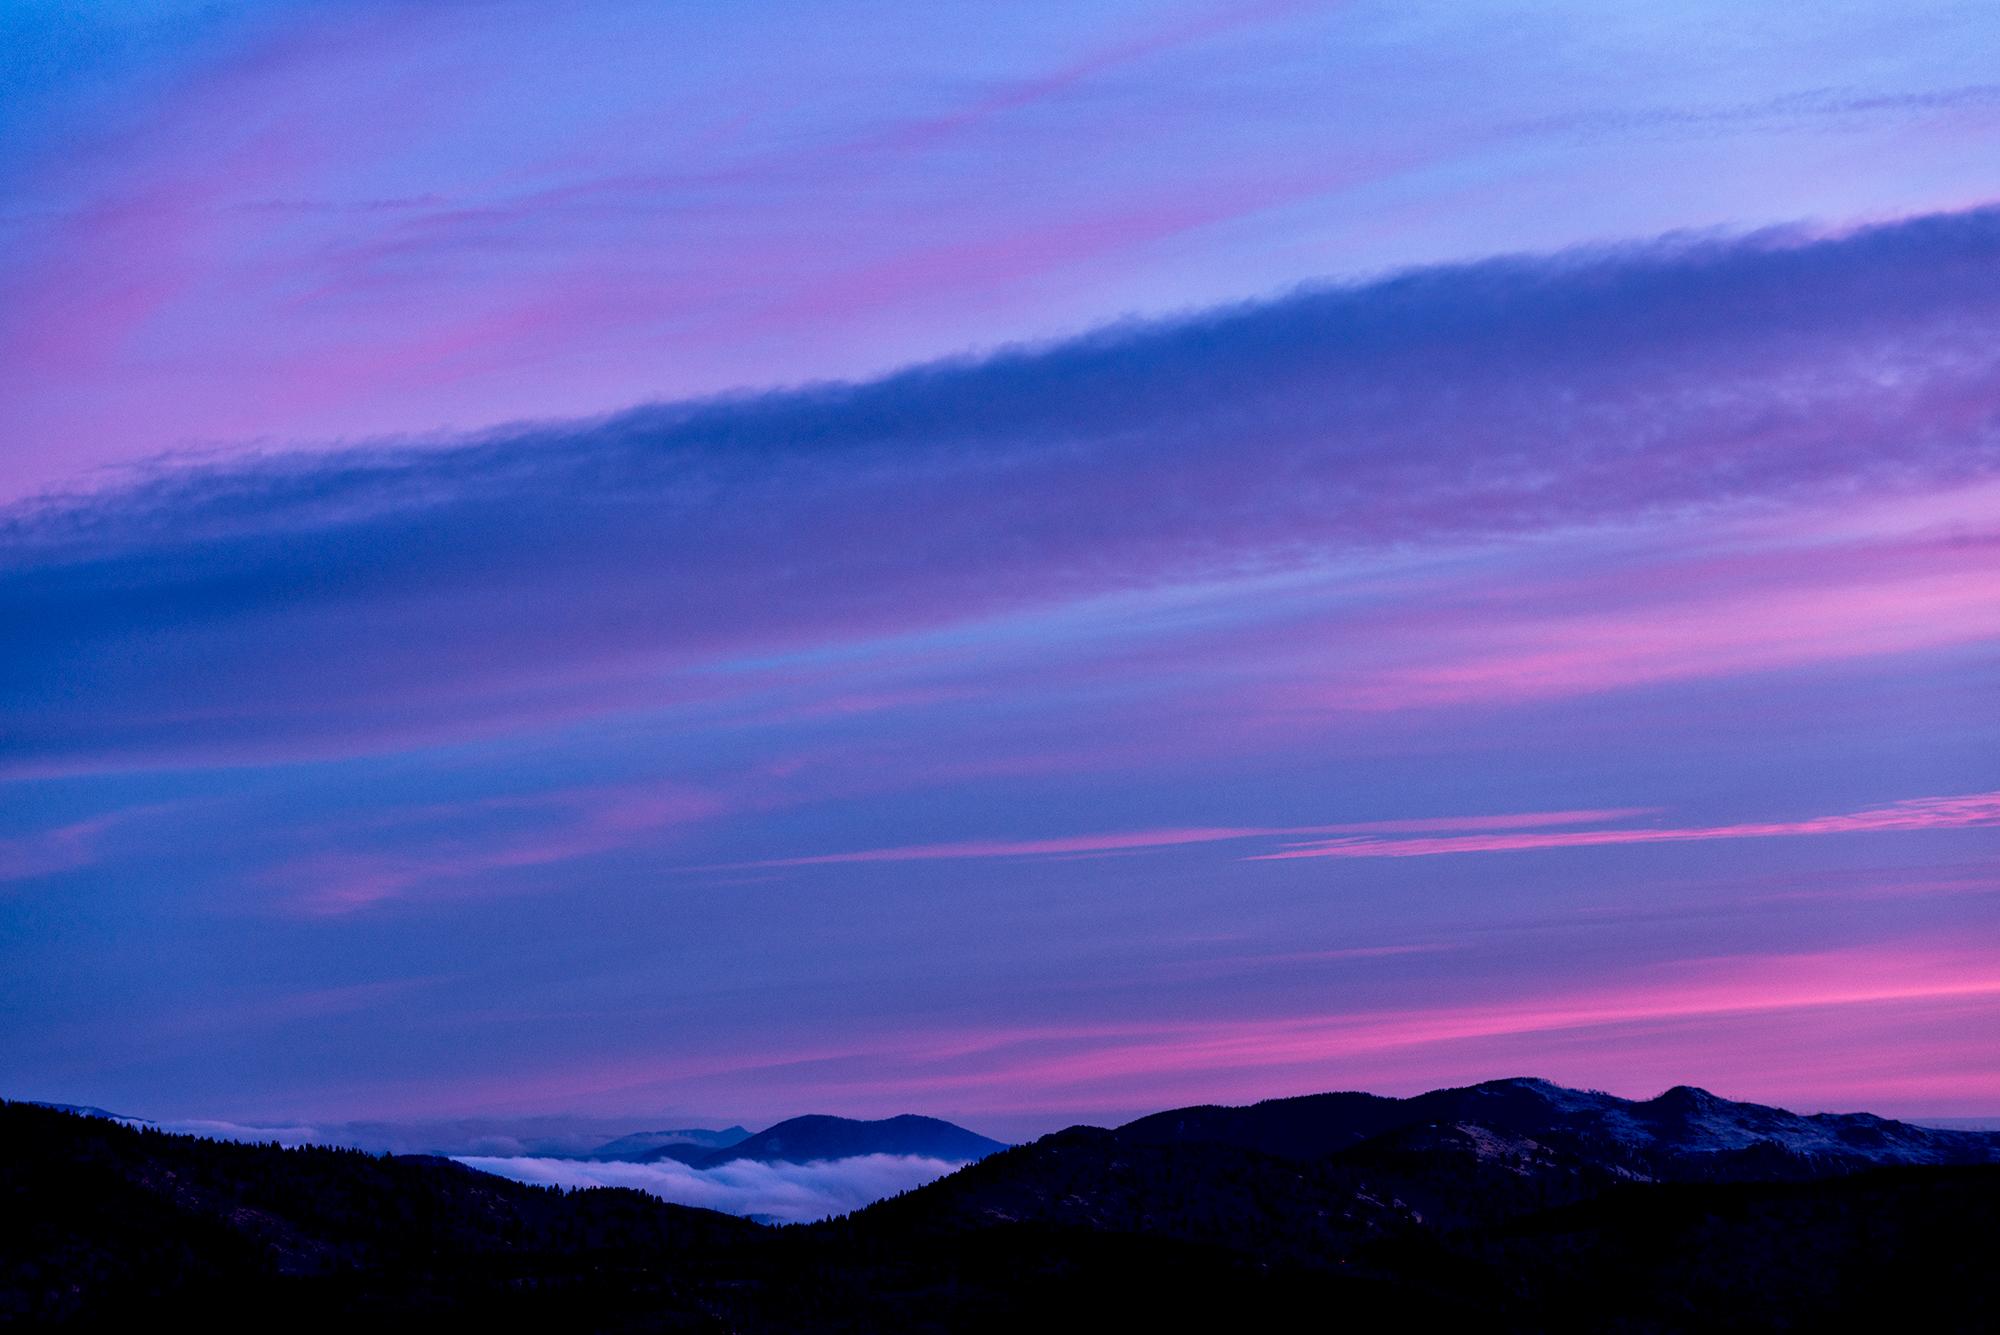 Sugarloaf, #5. Sugarloaf Mountain, Colorado, 2017